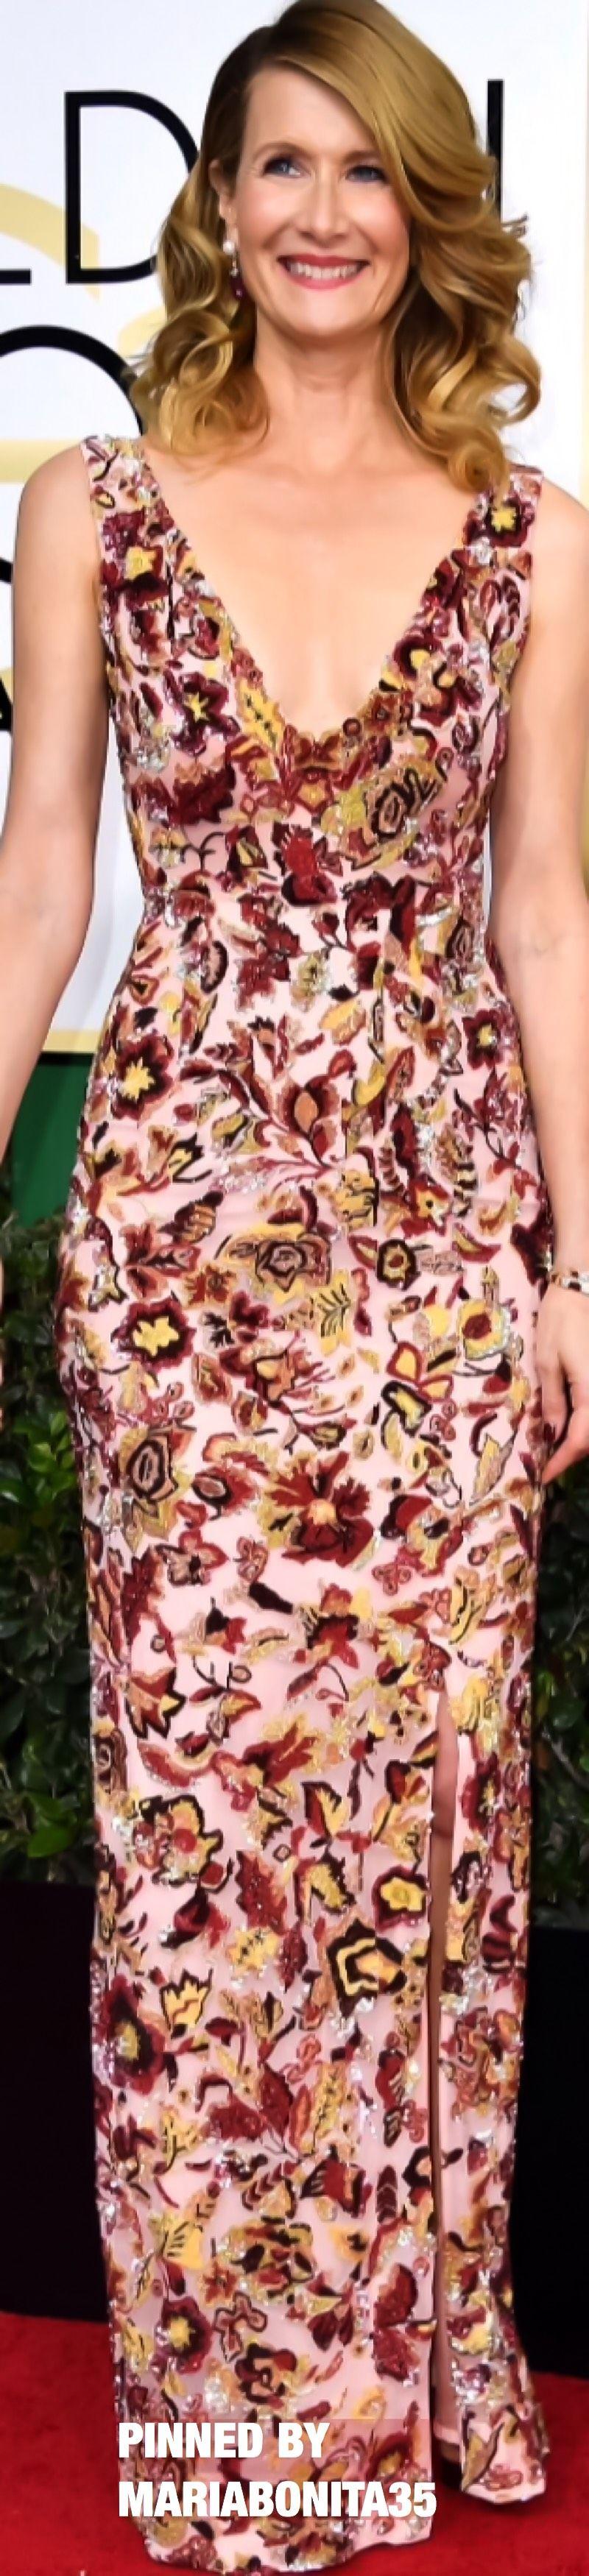 2017 Golden Globe Awards Red Carpet Arrivals Laura Dern wearing ...